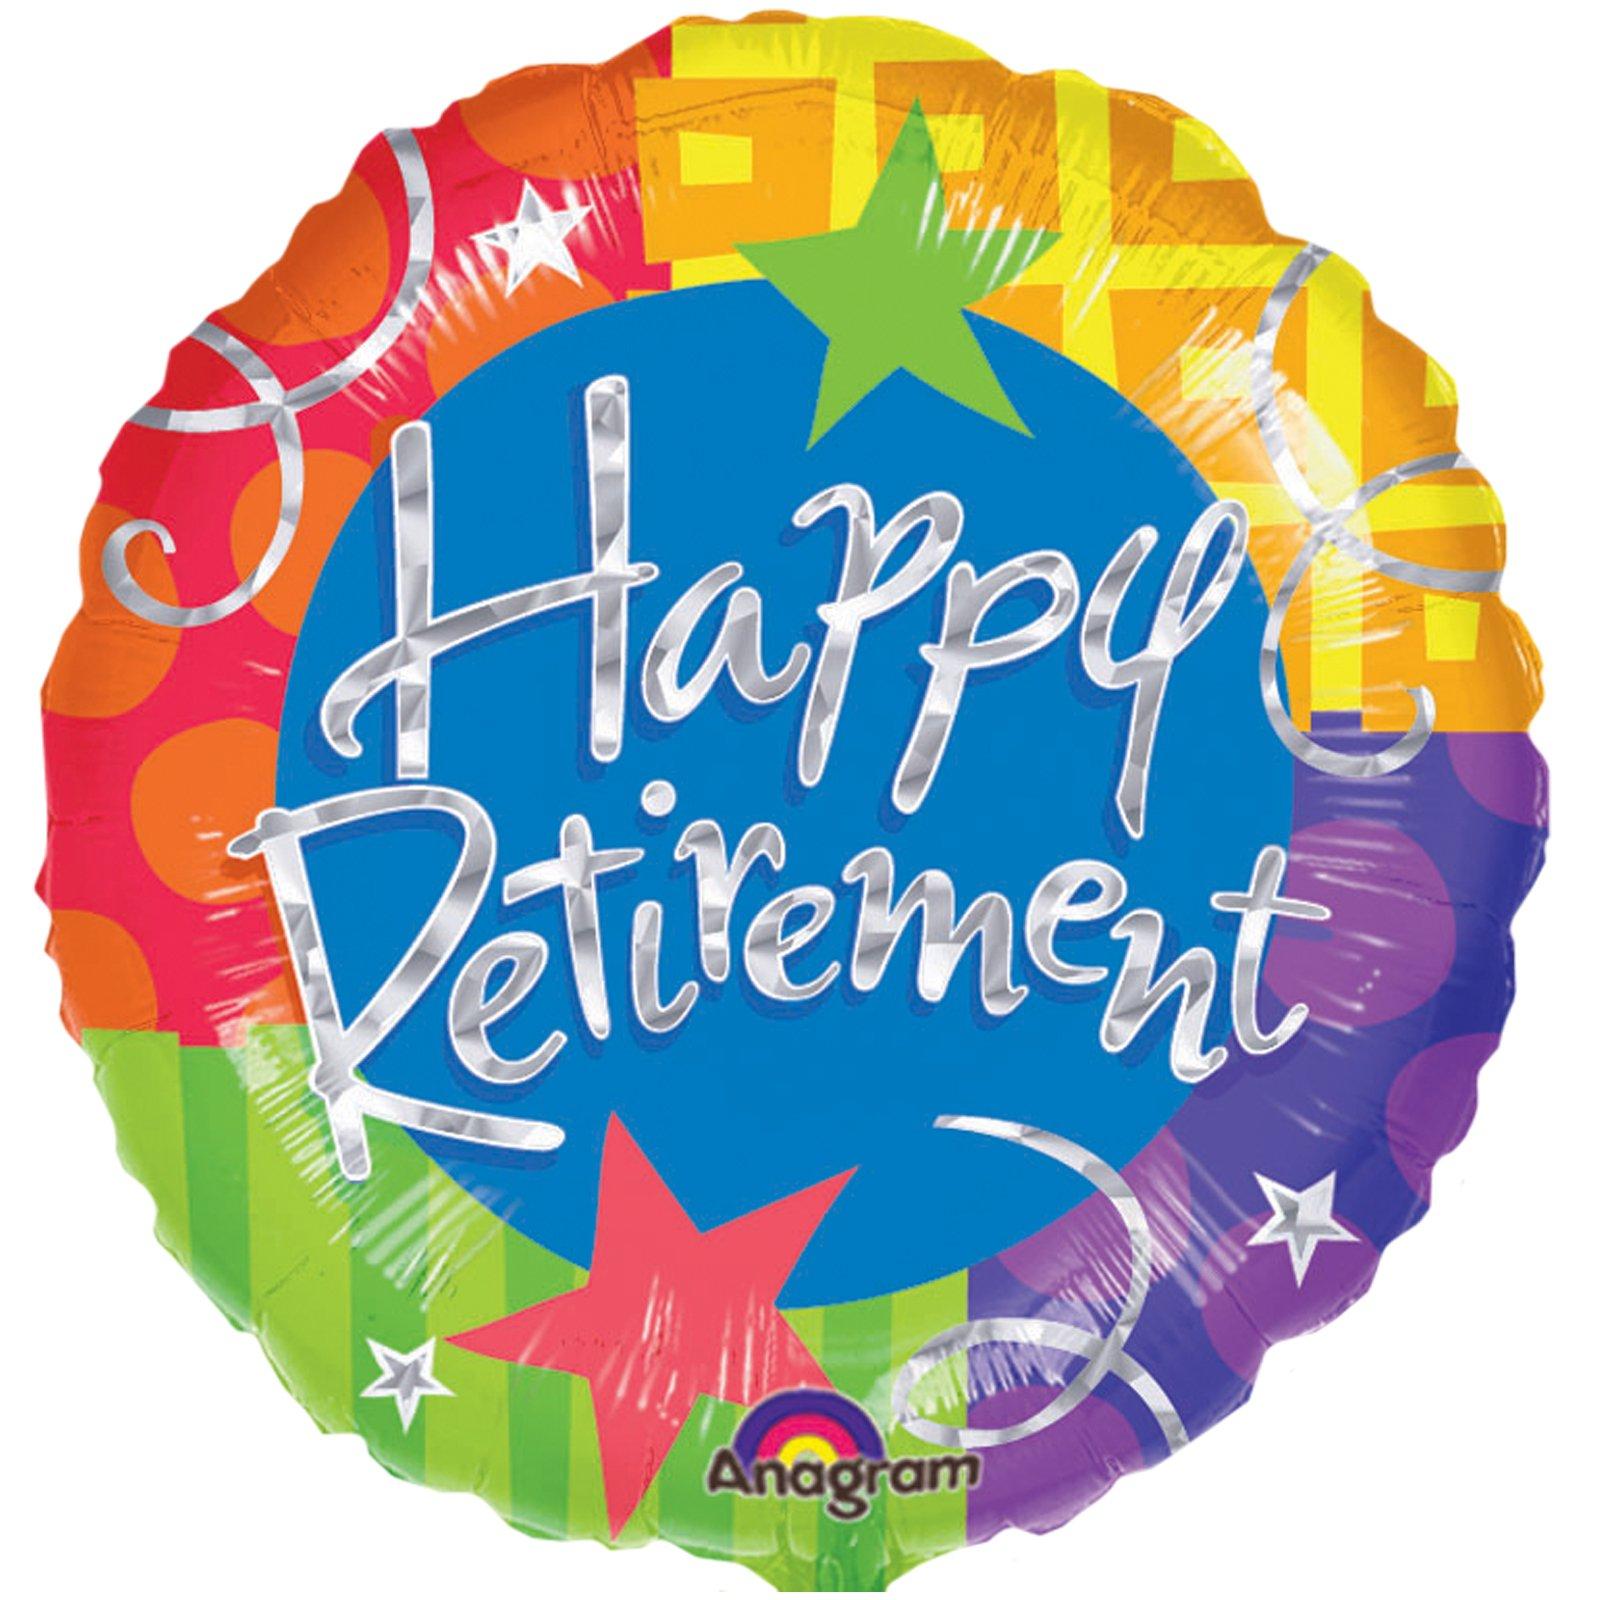 Free Happy Retirement, Download Free Clip Art, Free Clip Art.